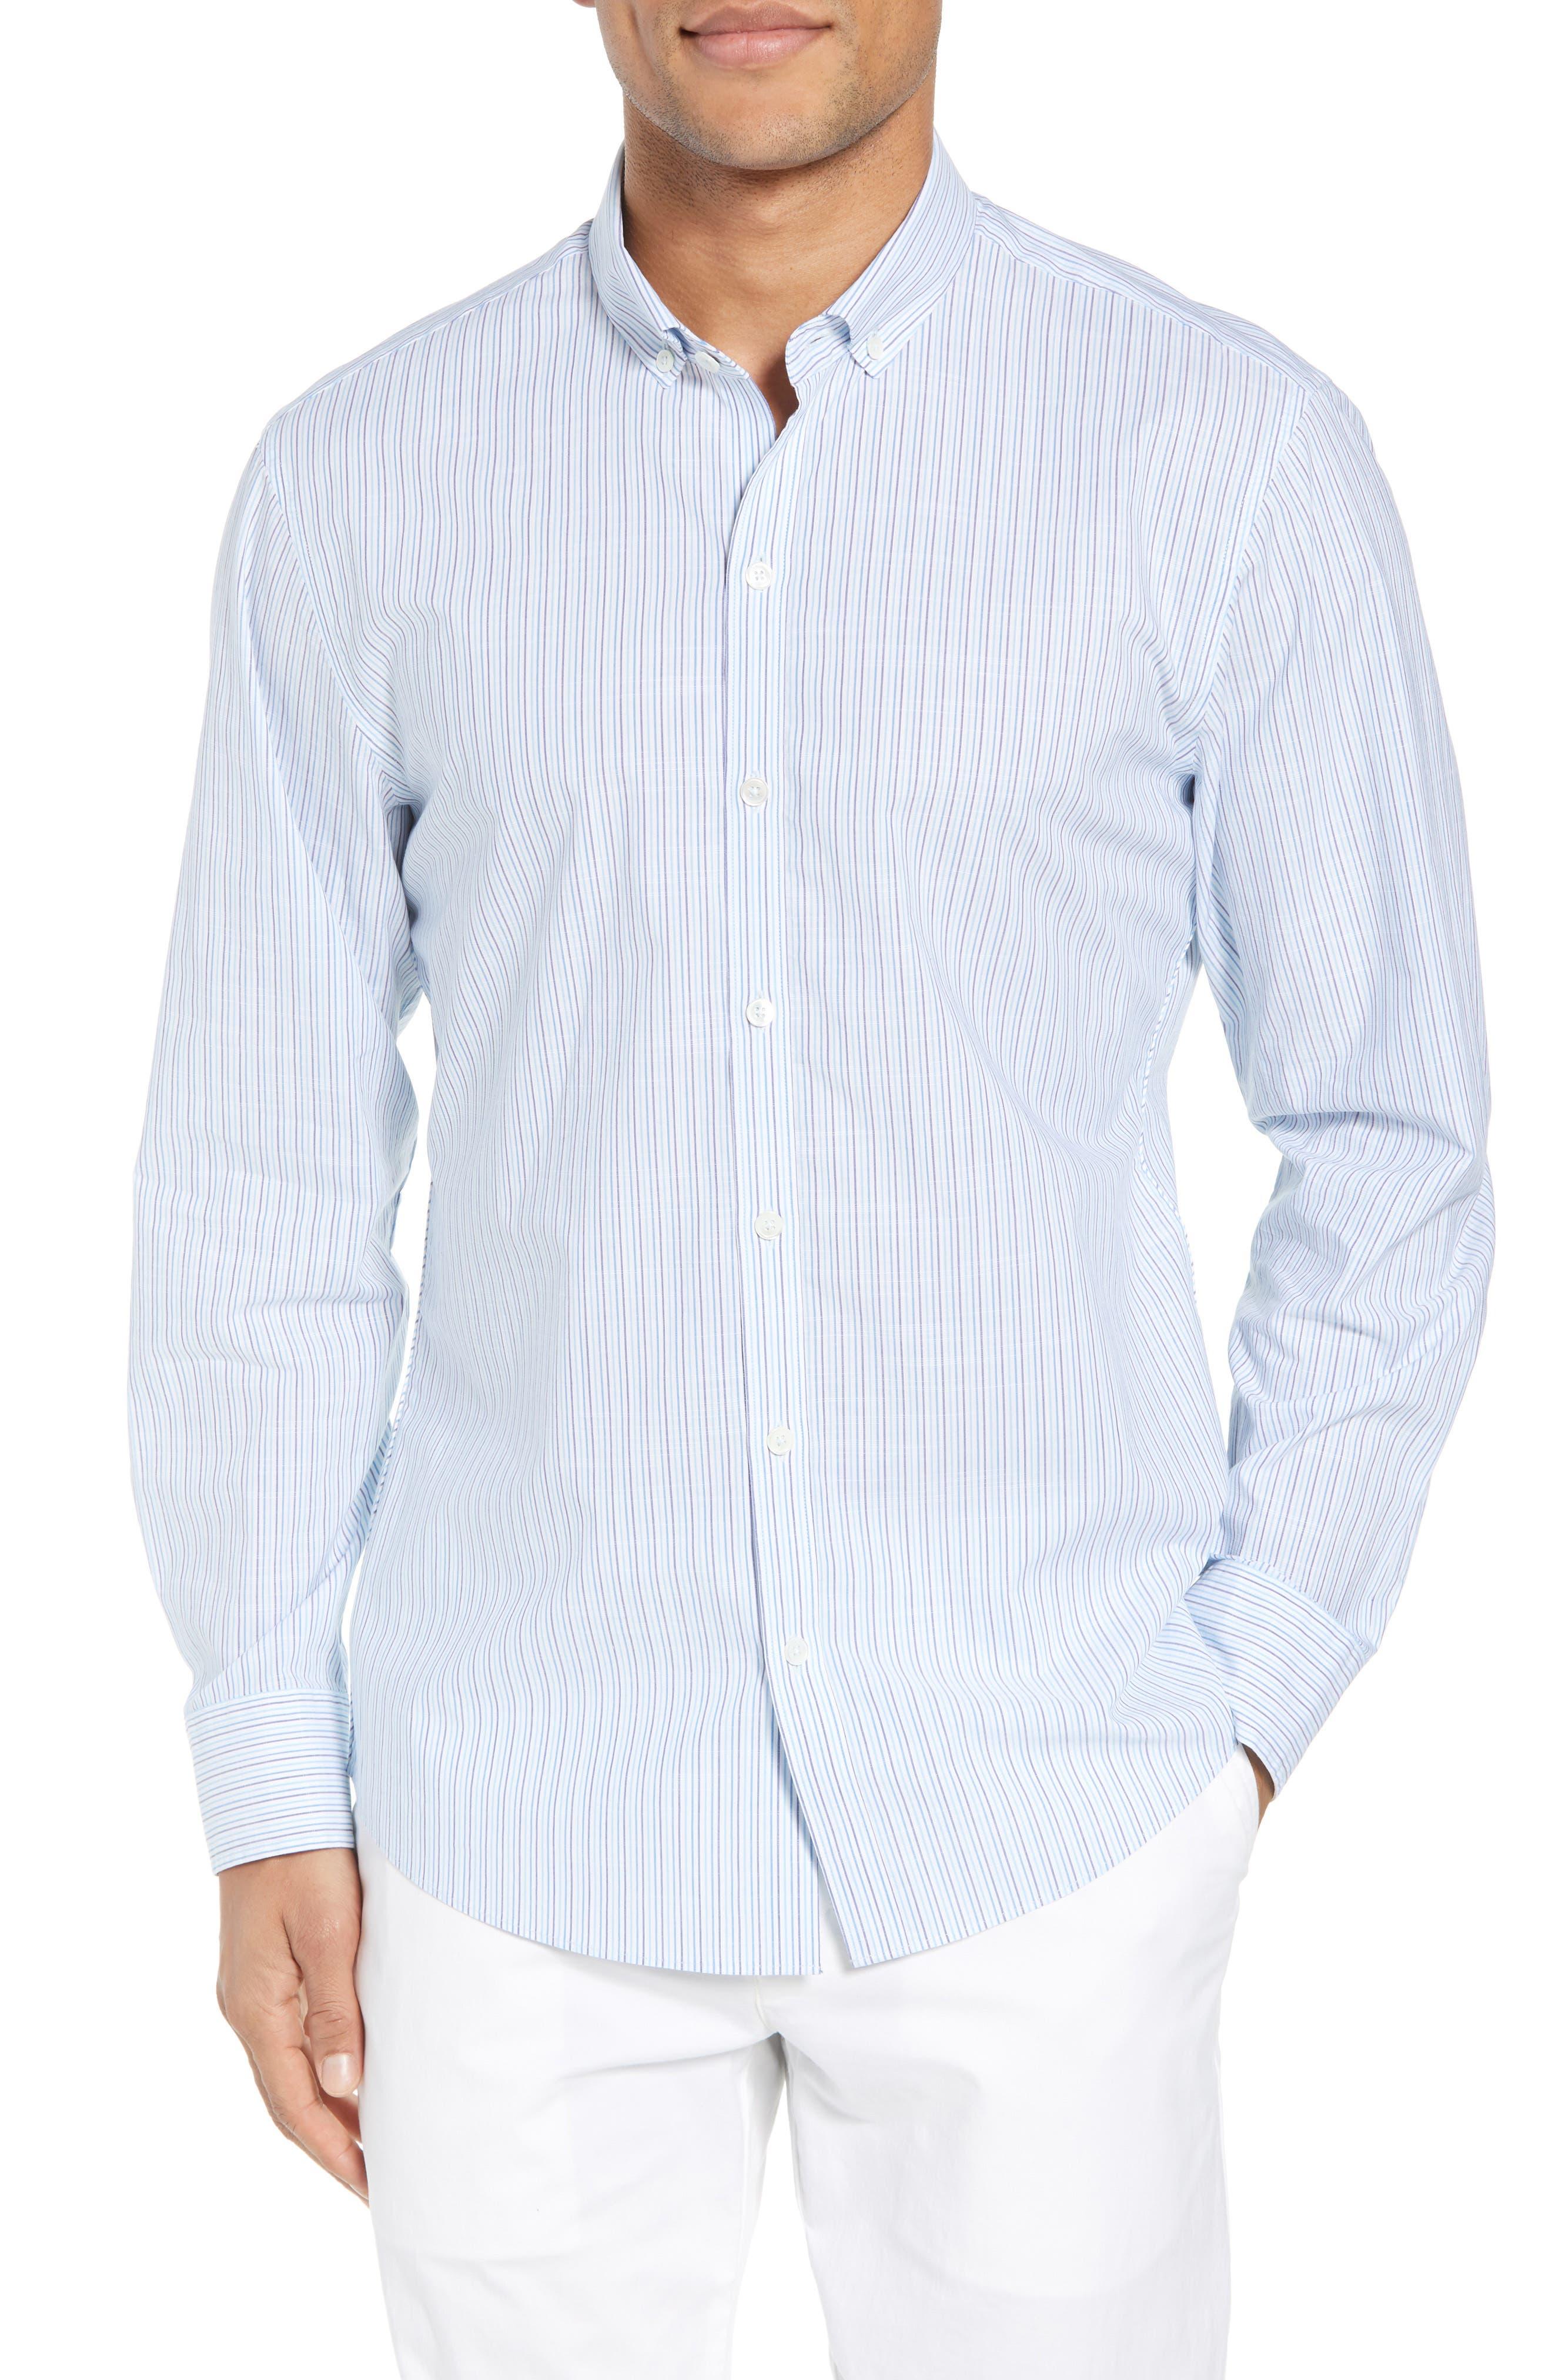 Skeeter Stripe Sport Shirt,                         Main,                         color, Aqua